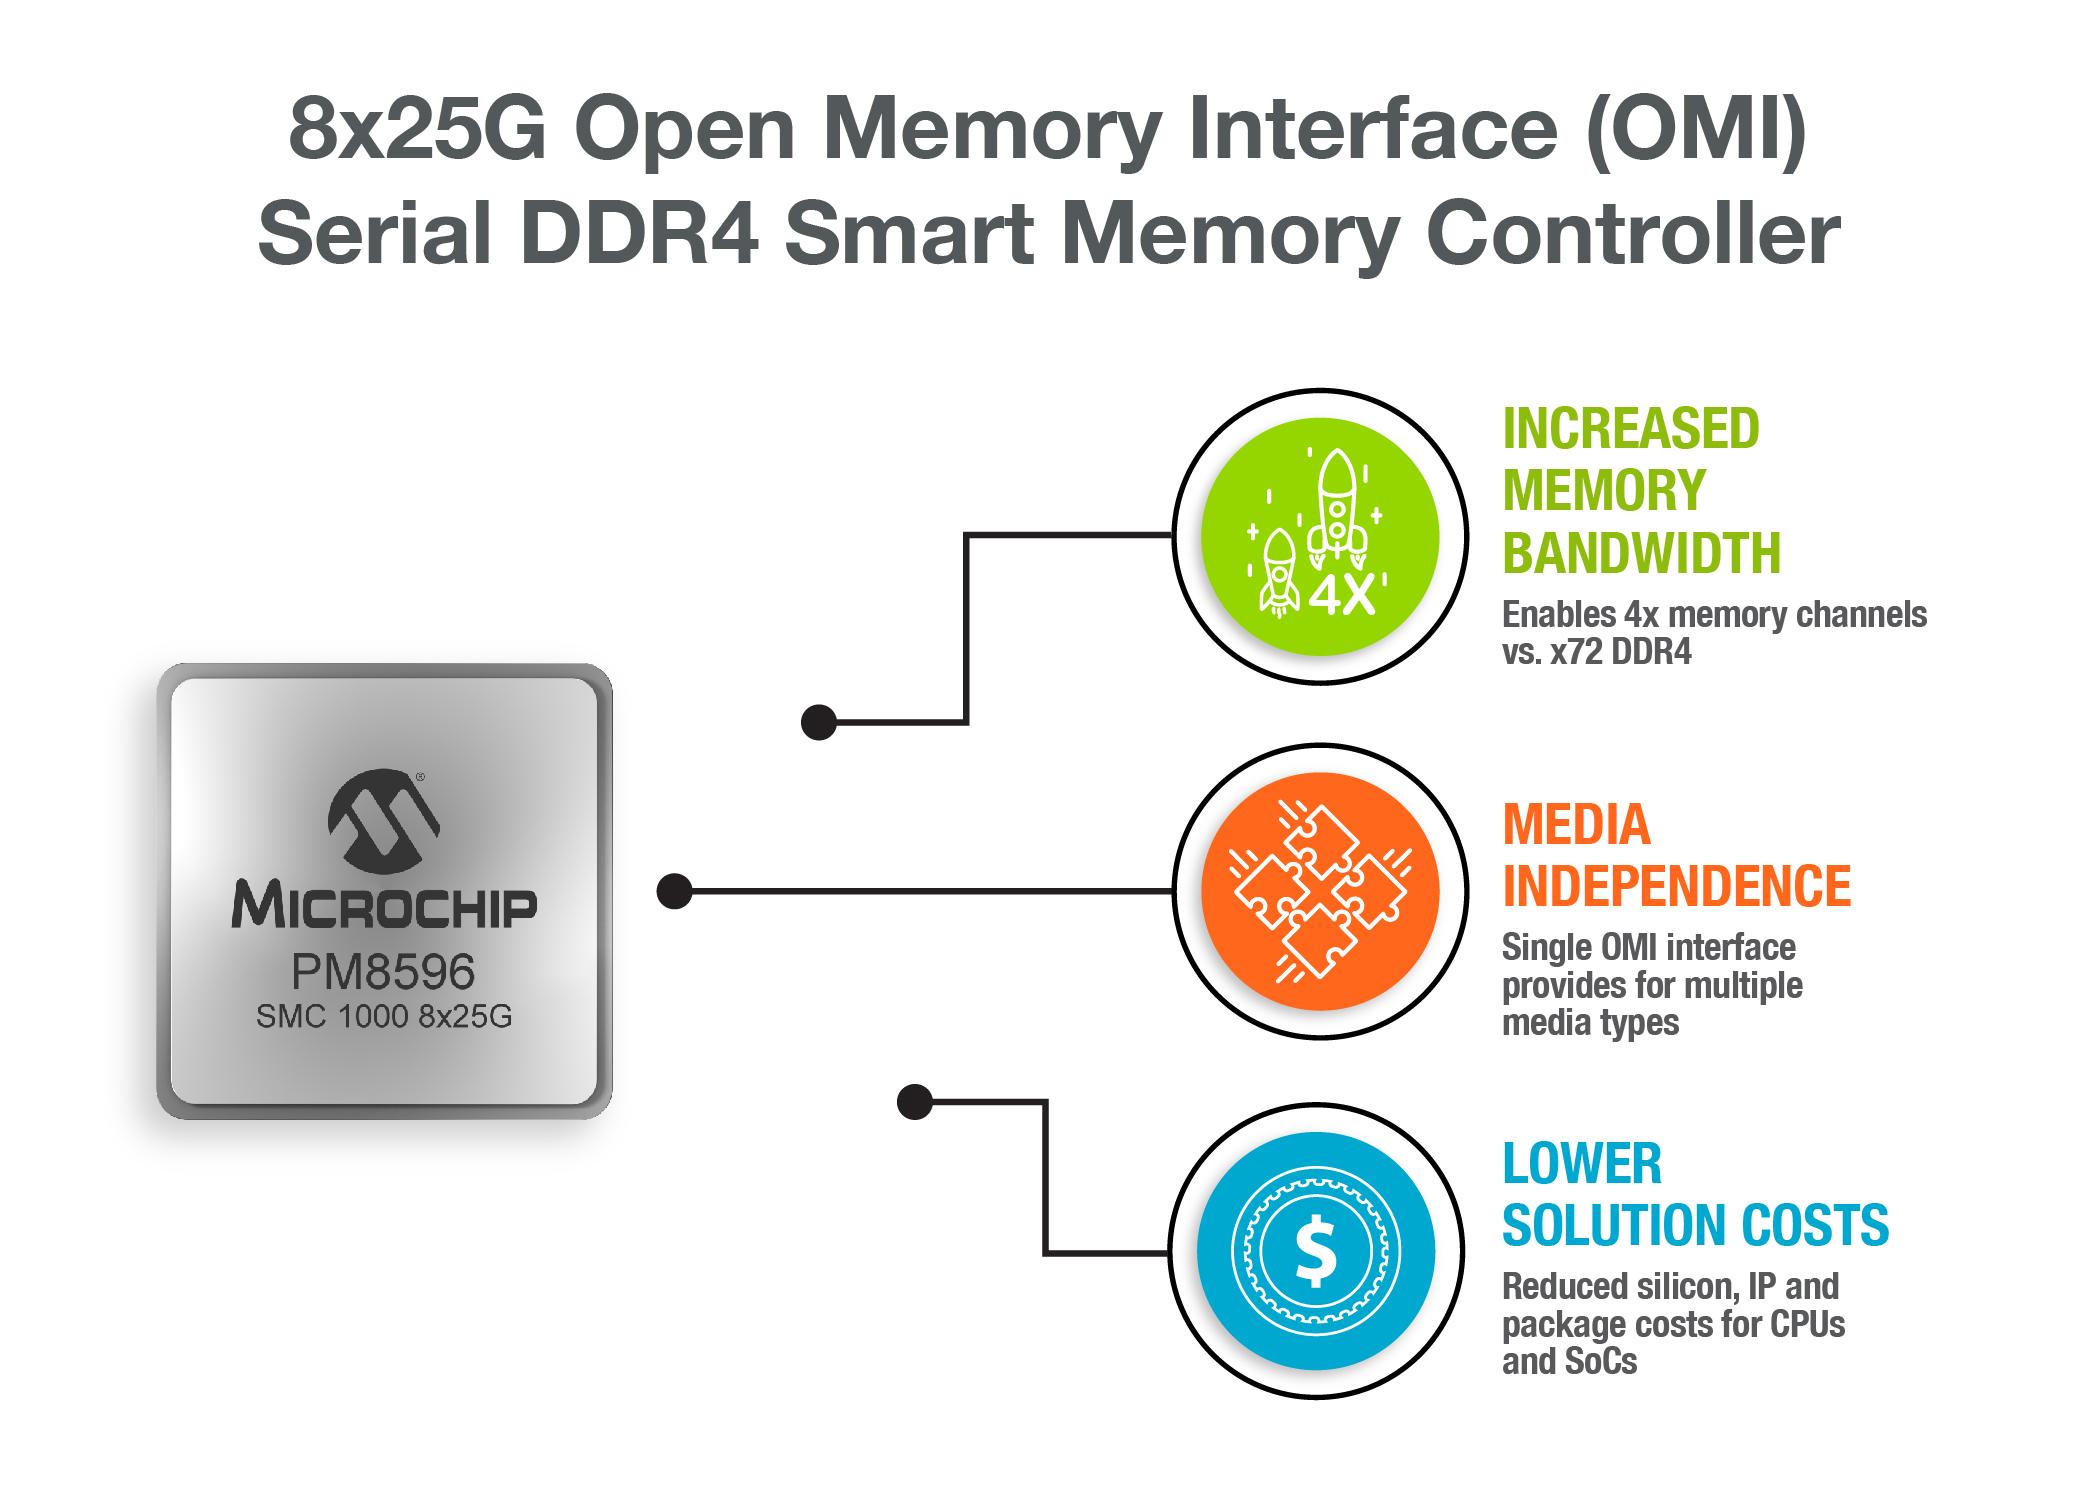 SMC 1000 8x25G   Microsemi